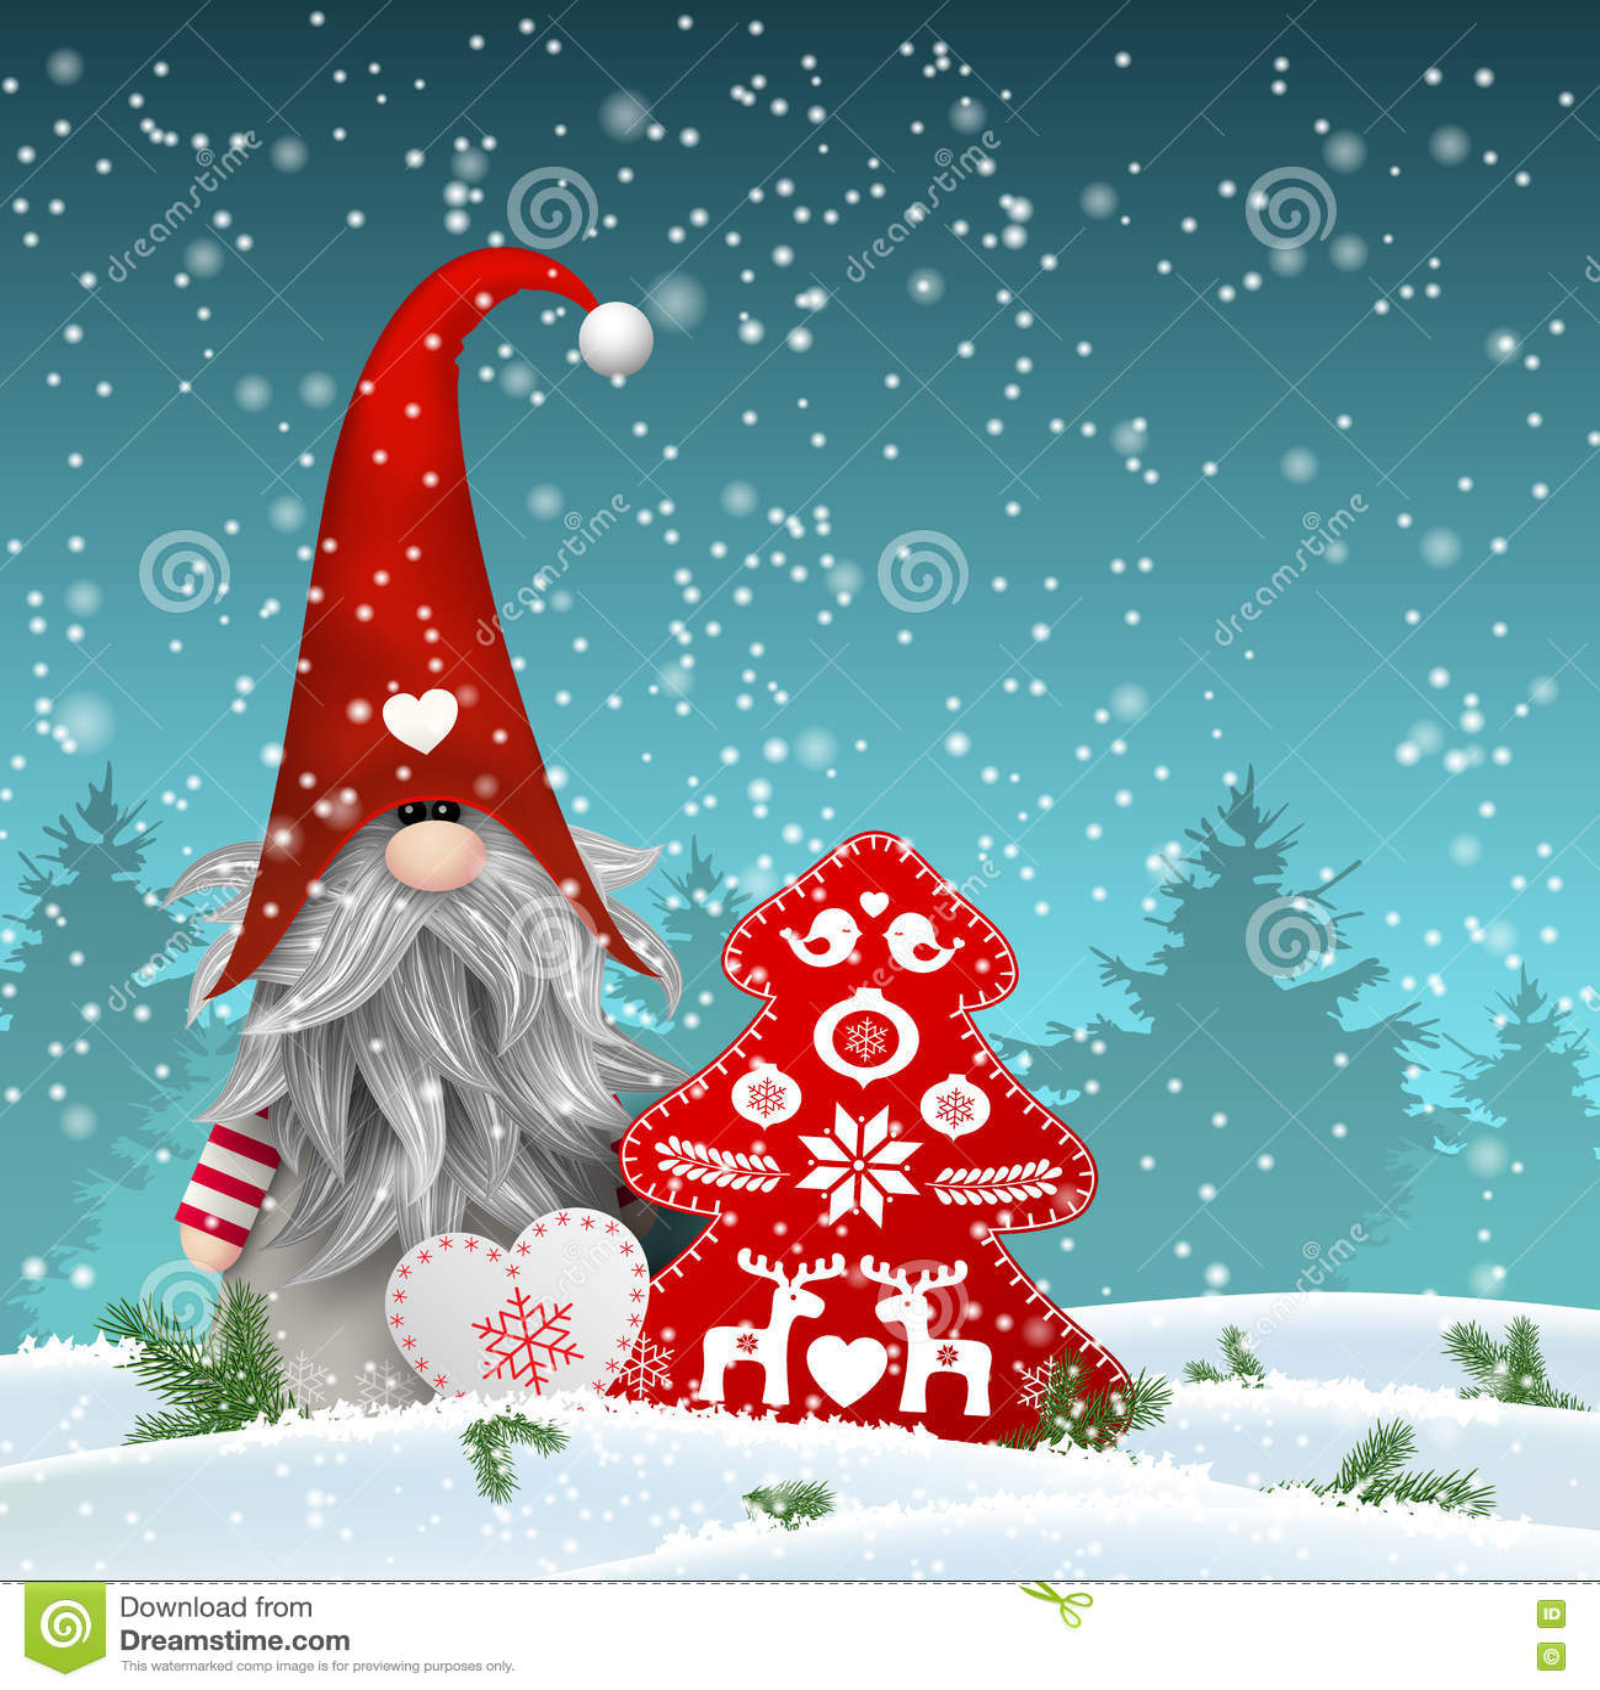 Scandinavian christmas traditional gnome tomte with other seasonal scandinavian christmas traditional gnome tomte with other seasonal decorations illustration m4hsunfo